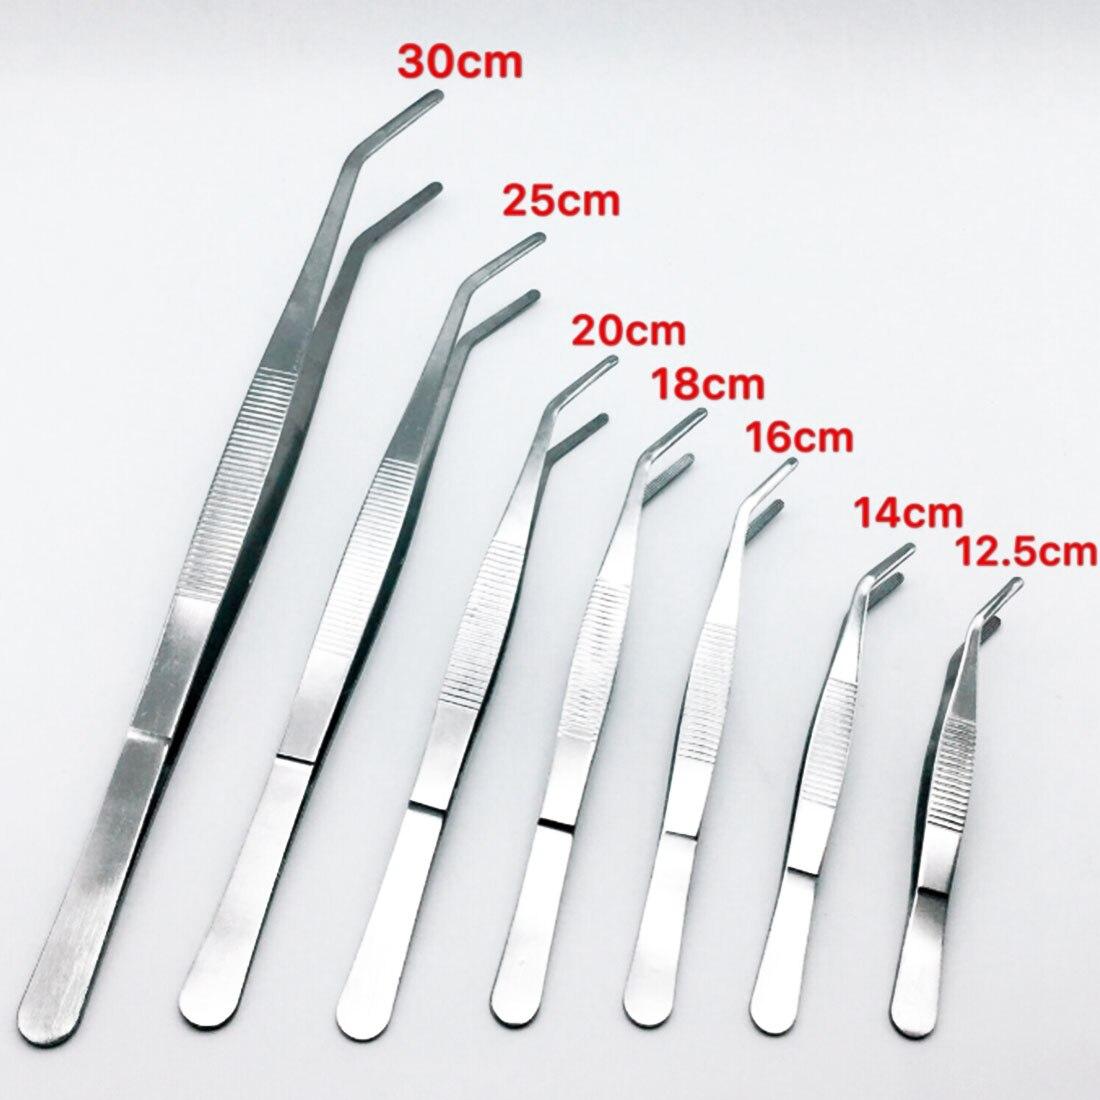 25 30 Www Bing Com: Stainless Steel Elbow Tweezers 12.5cm/14cm/16cm/18cm/20cm